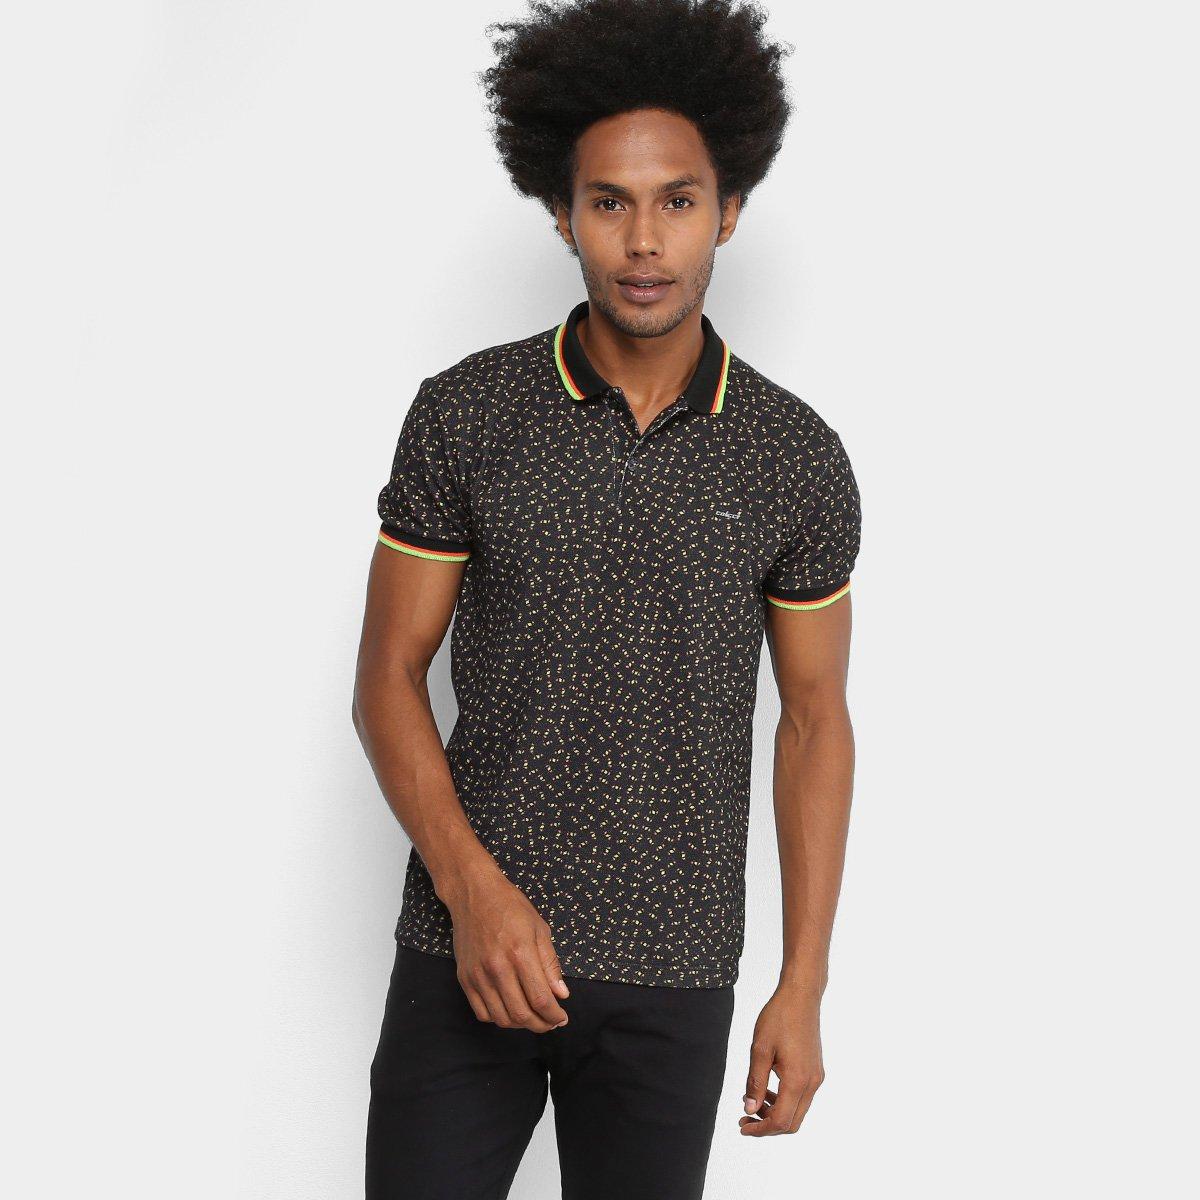 faf19ea03e Camisa Polo Colcci Estampada Masculina - Tam  GG - Shopping TudoAzul